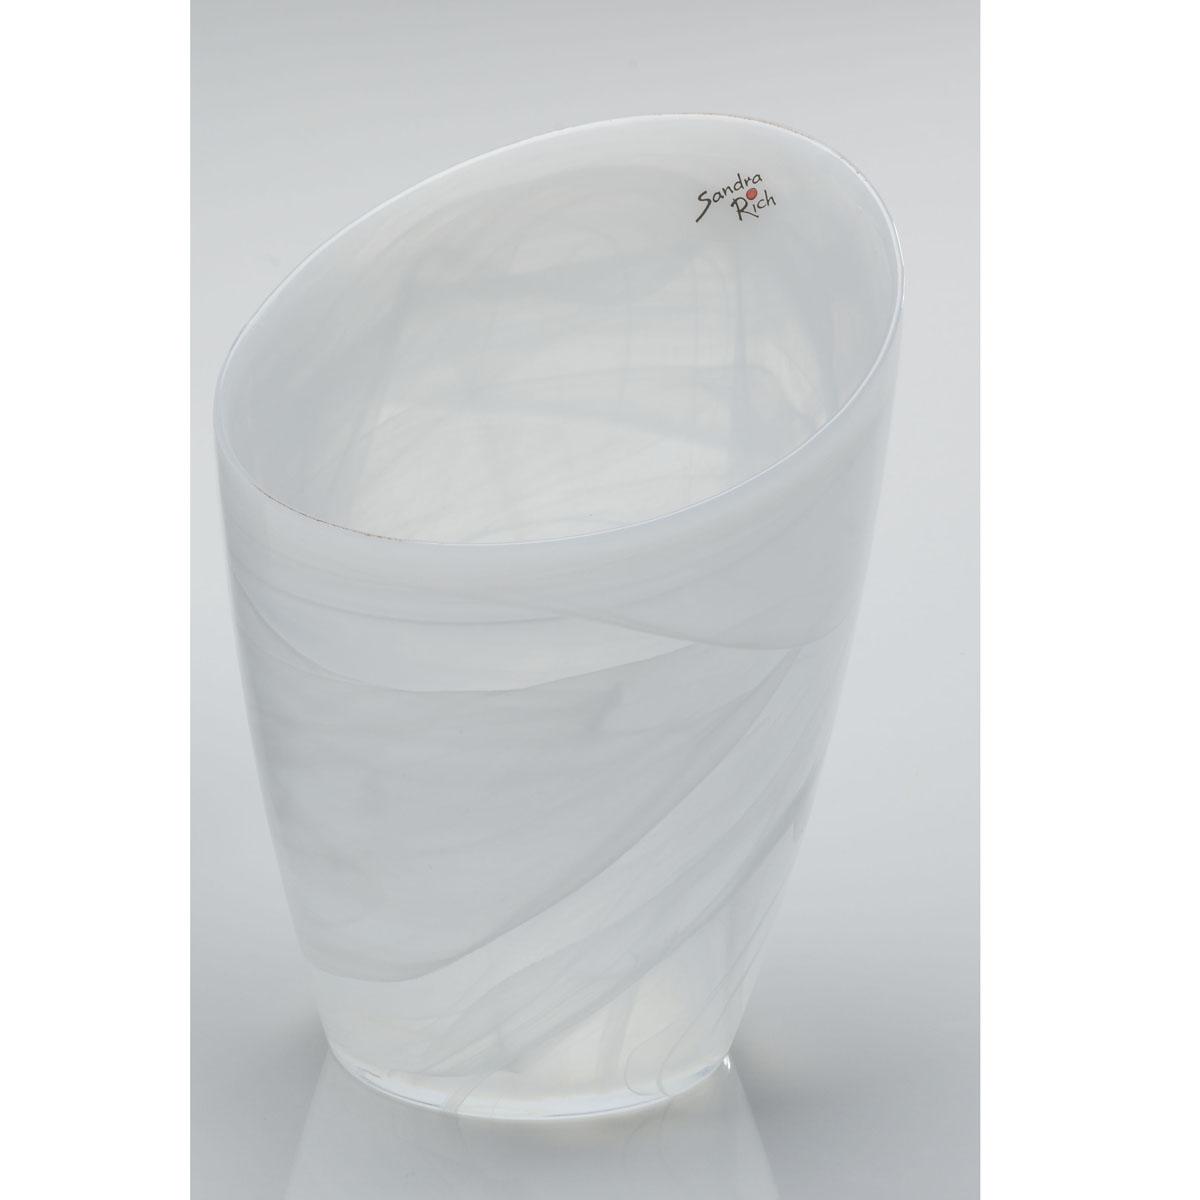 Vase glasvase blumentopf alabaster glas wei 18x15cm for Blumentopf glas